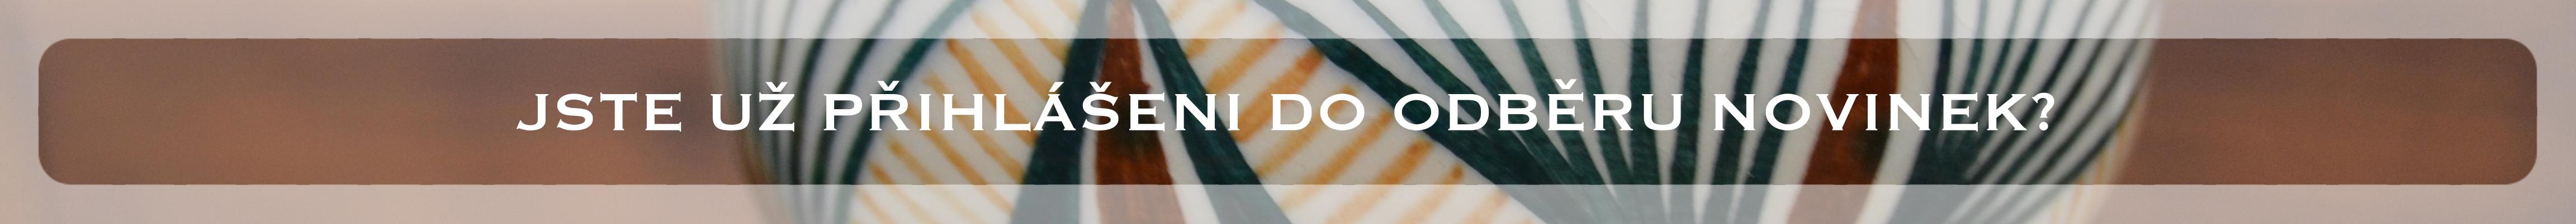 banner-newsletter NH - 1_Fotor